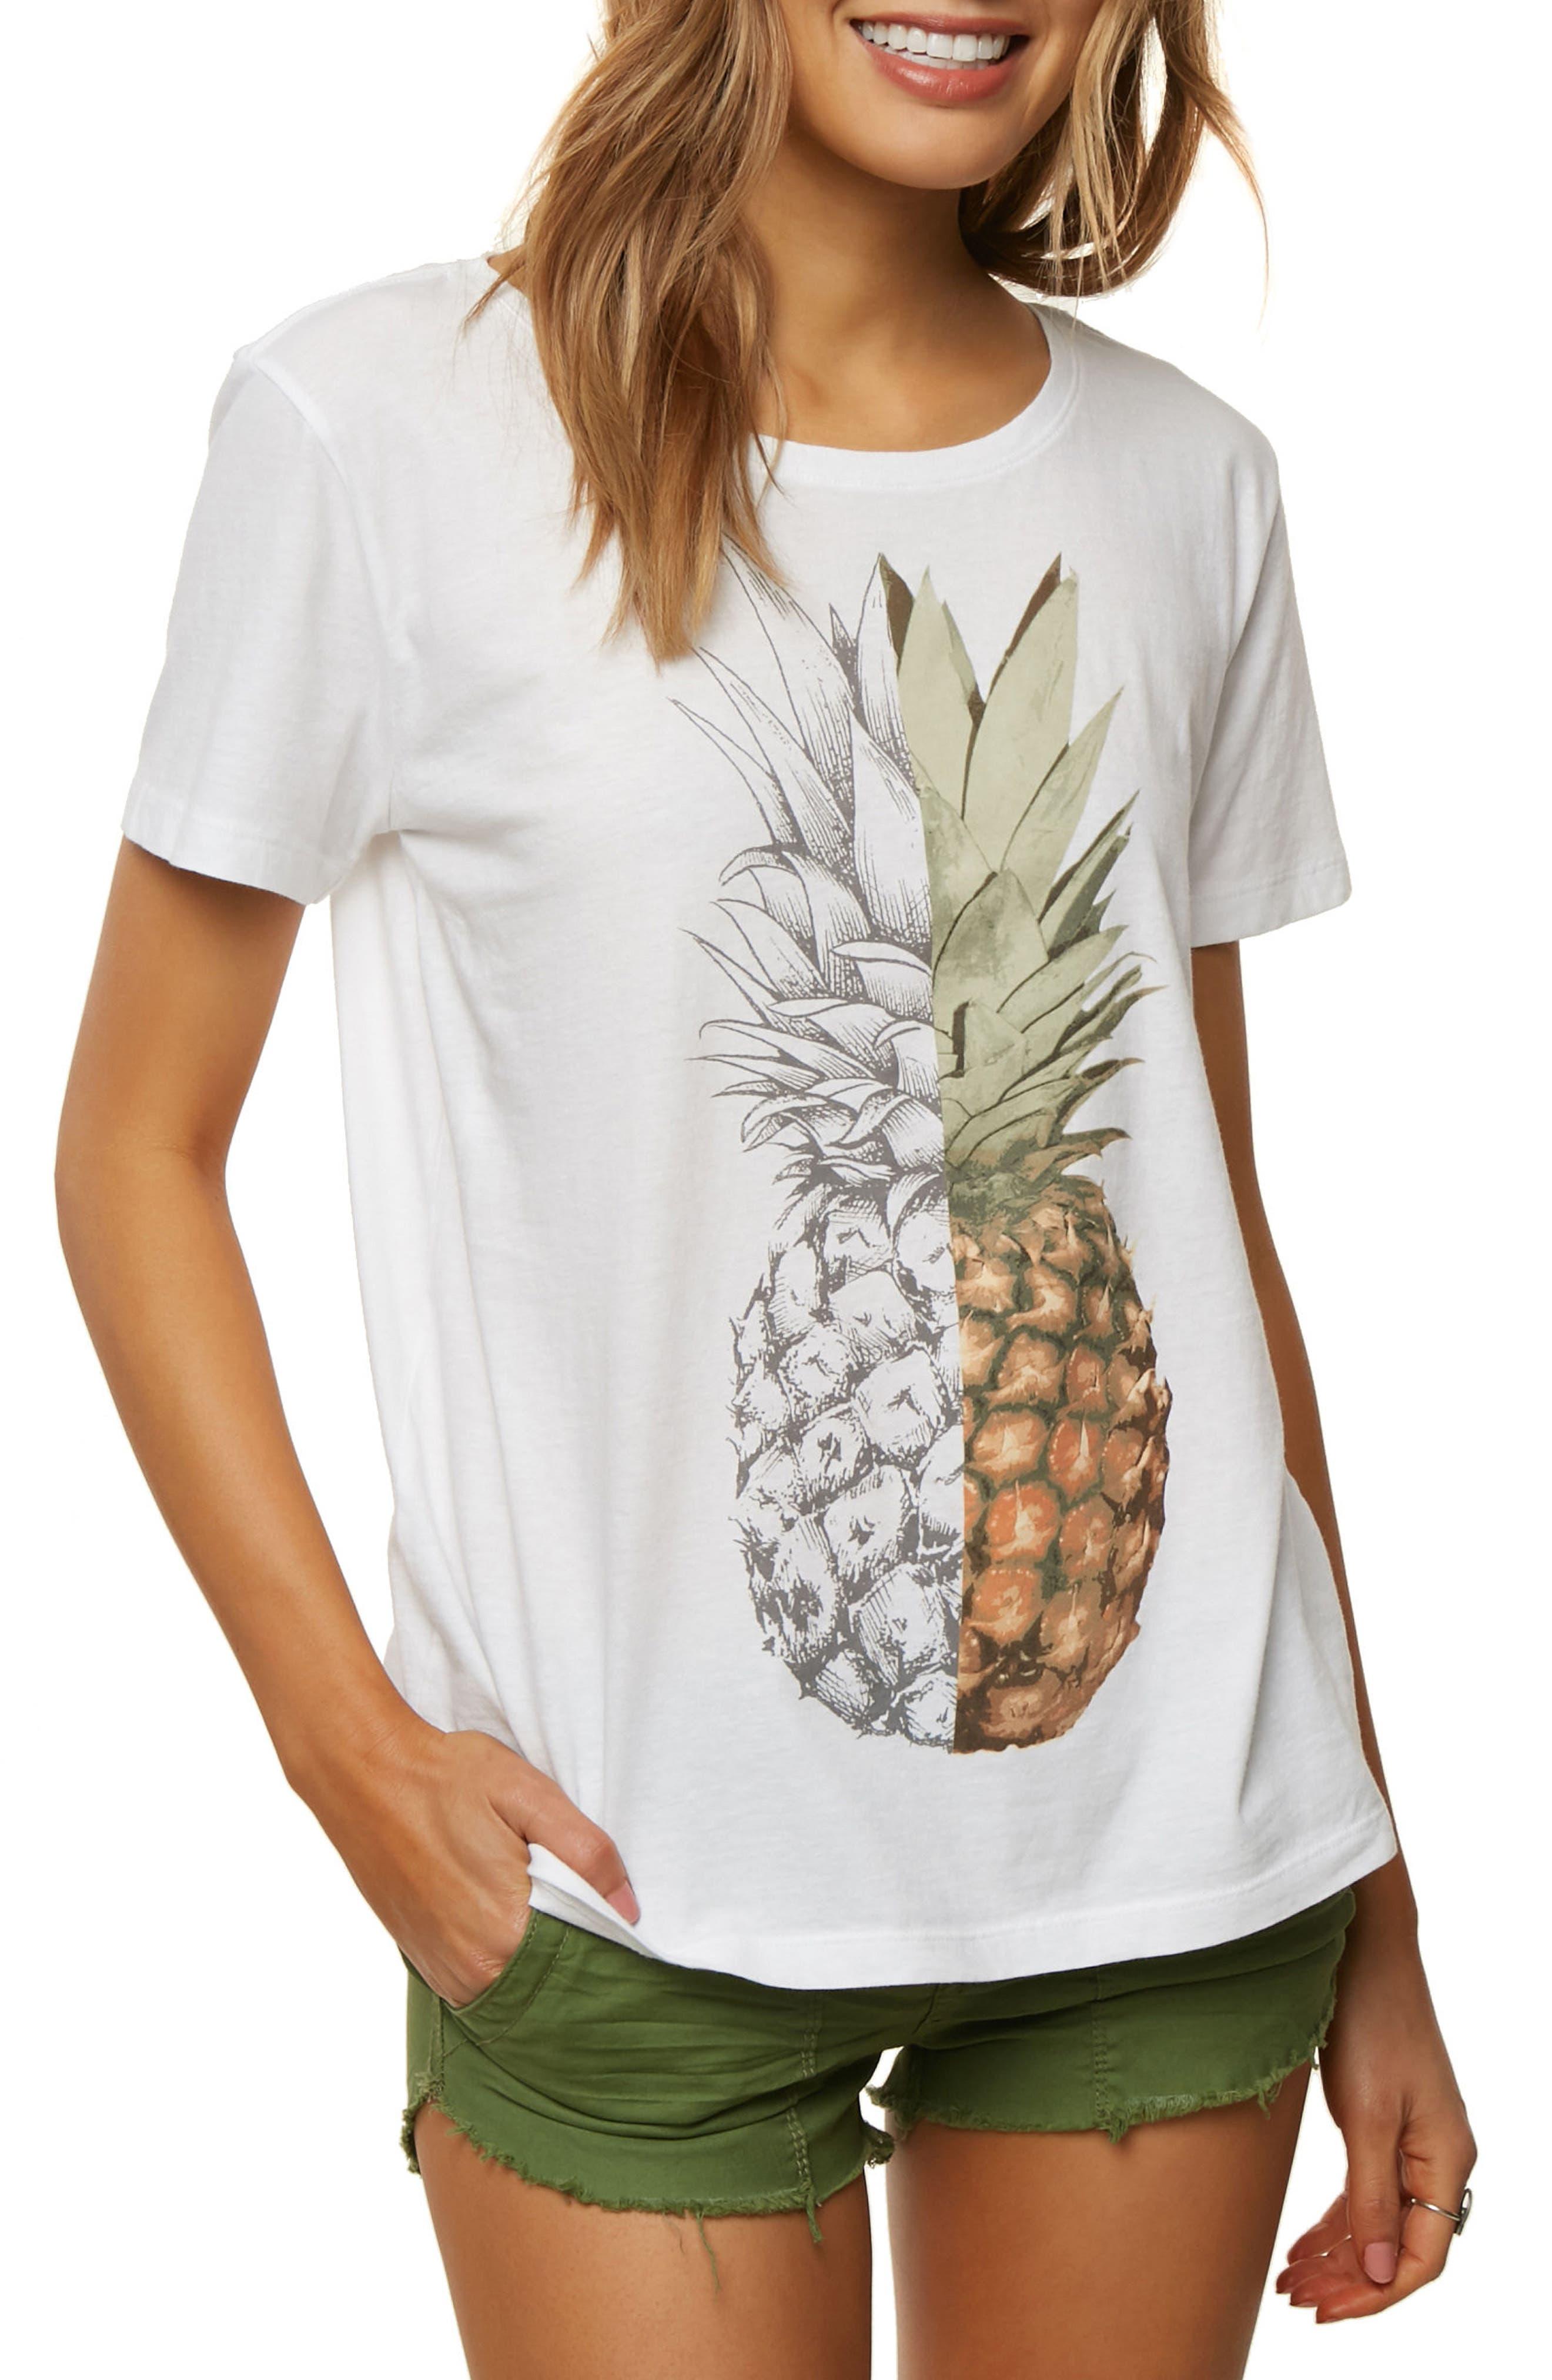 Alternate Image 1 Selected - O'Neill Half n Half Pineapple Graphic Tee